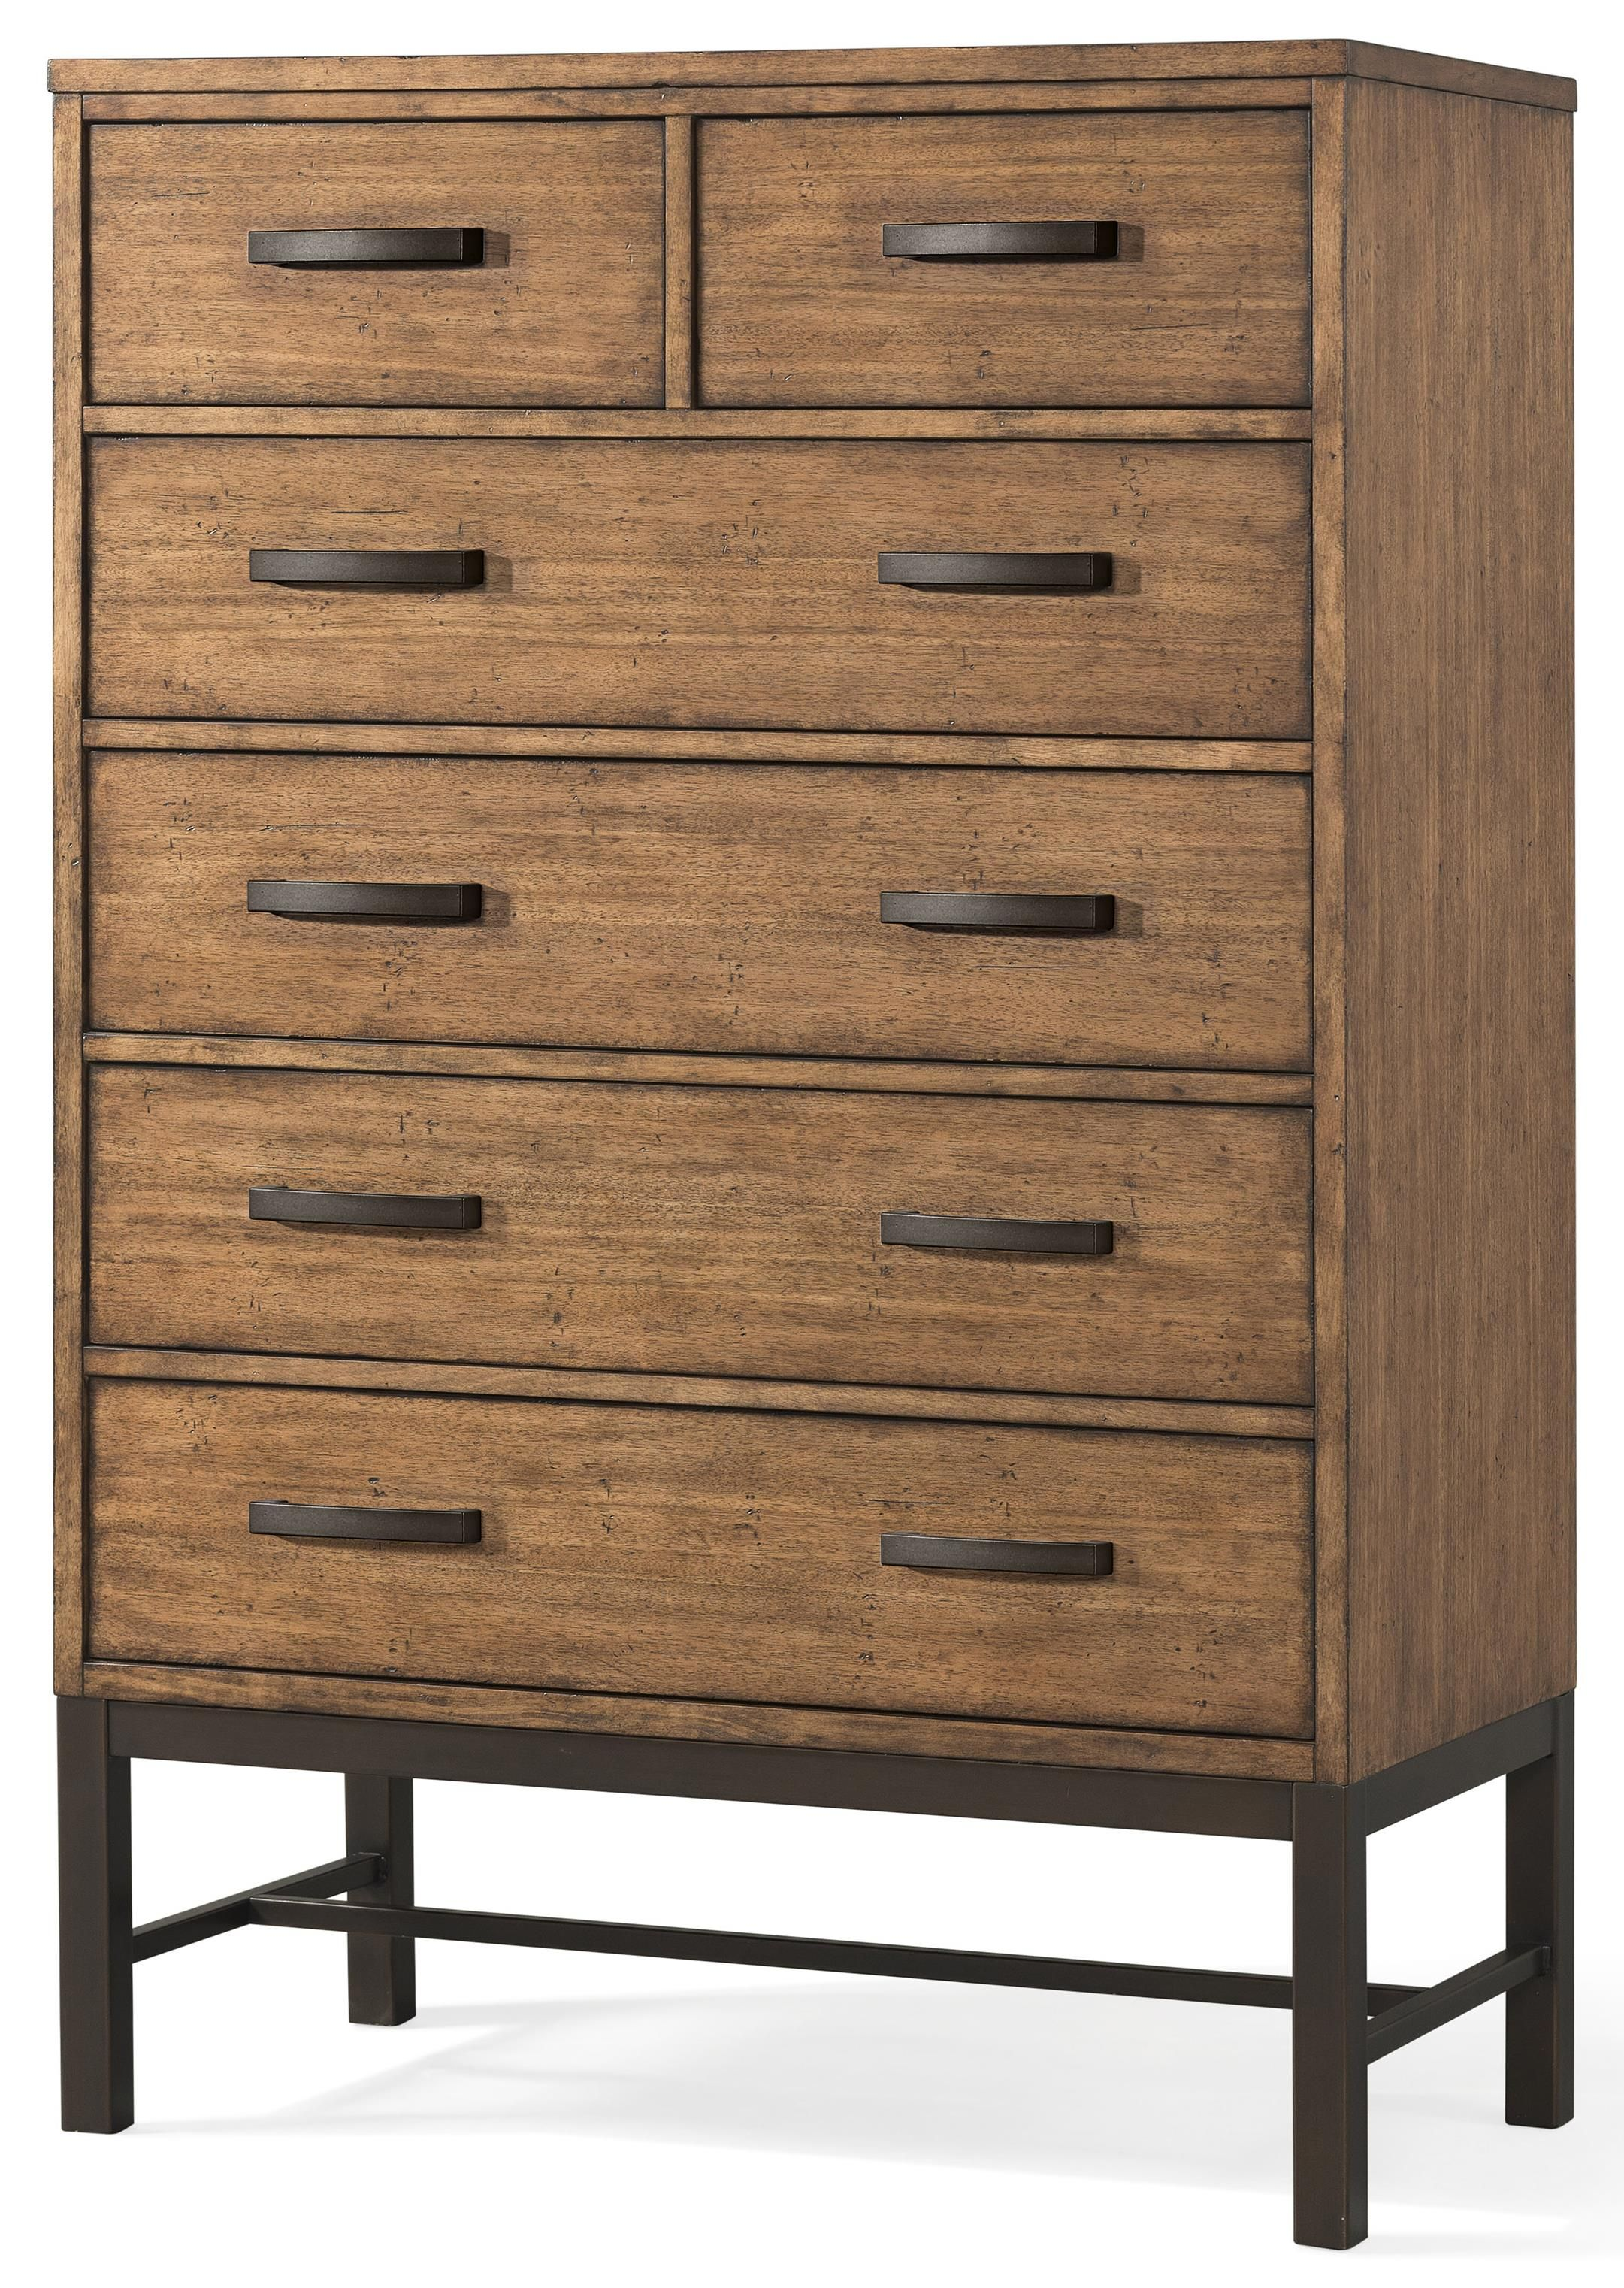 Hom Furniture Dressers